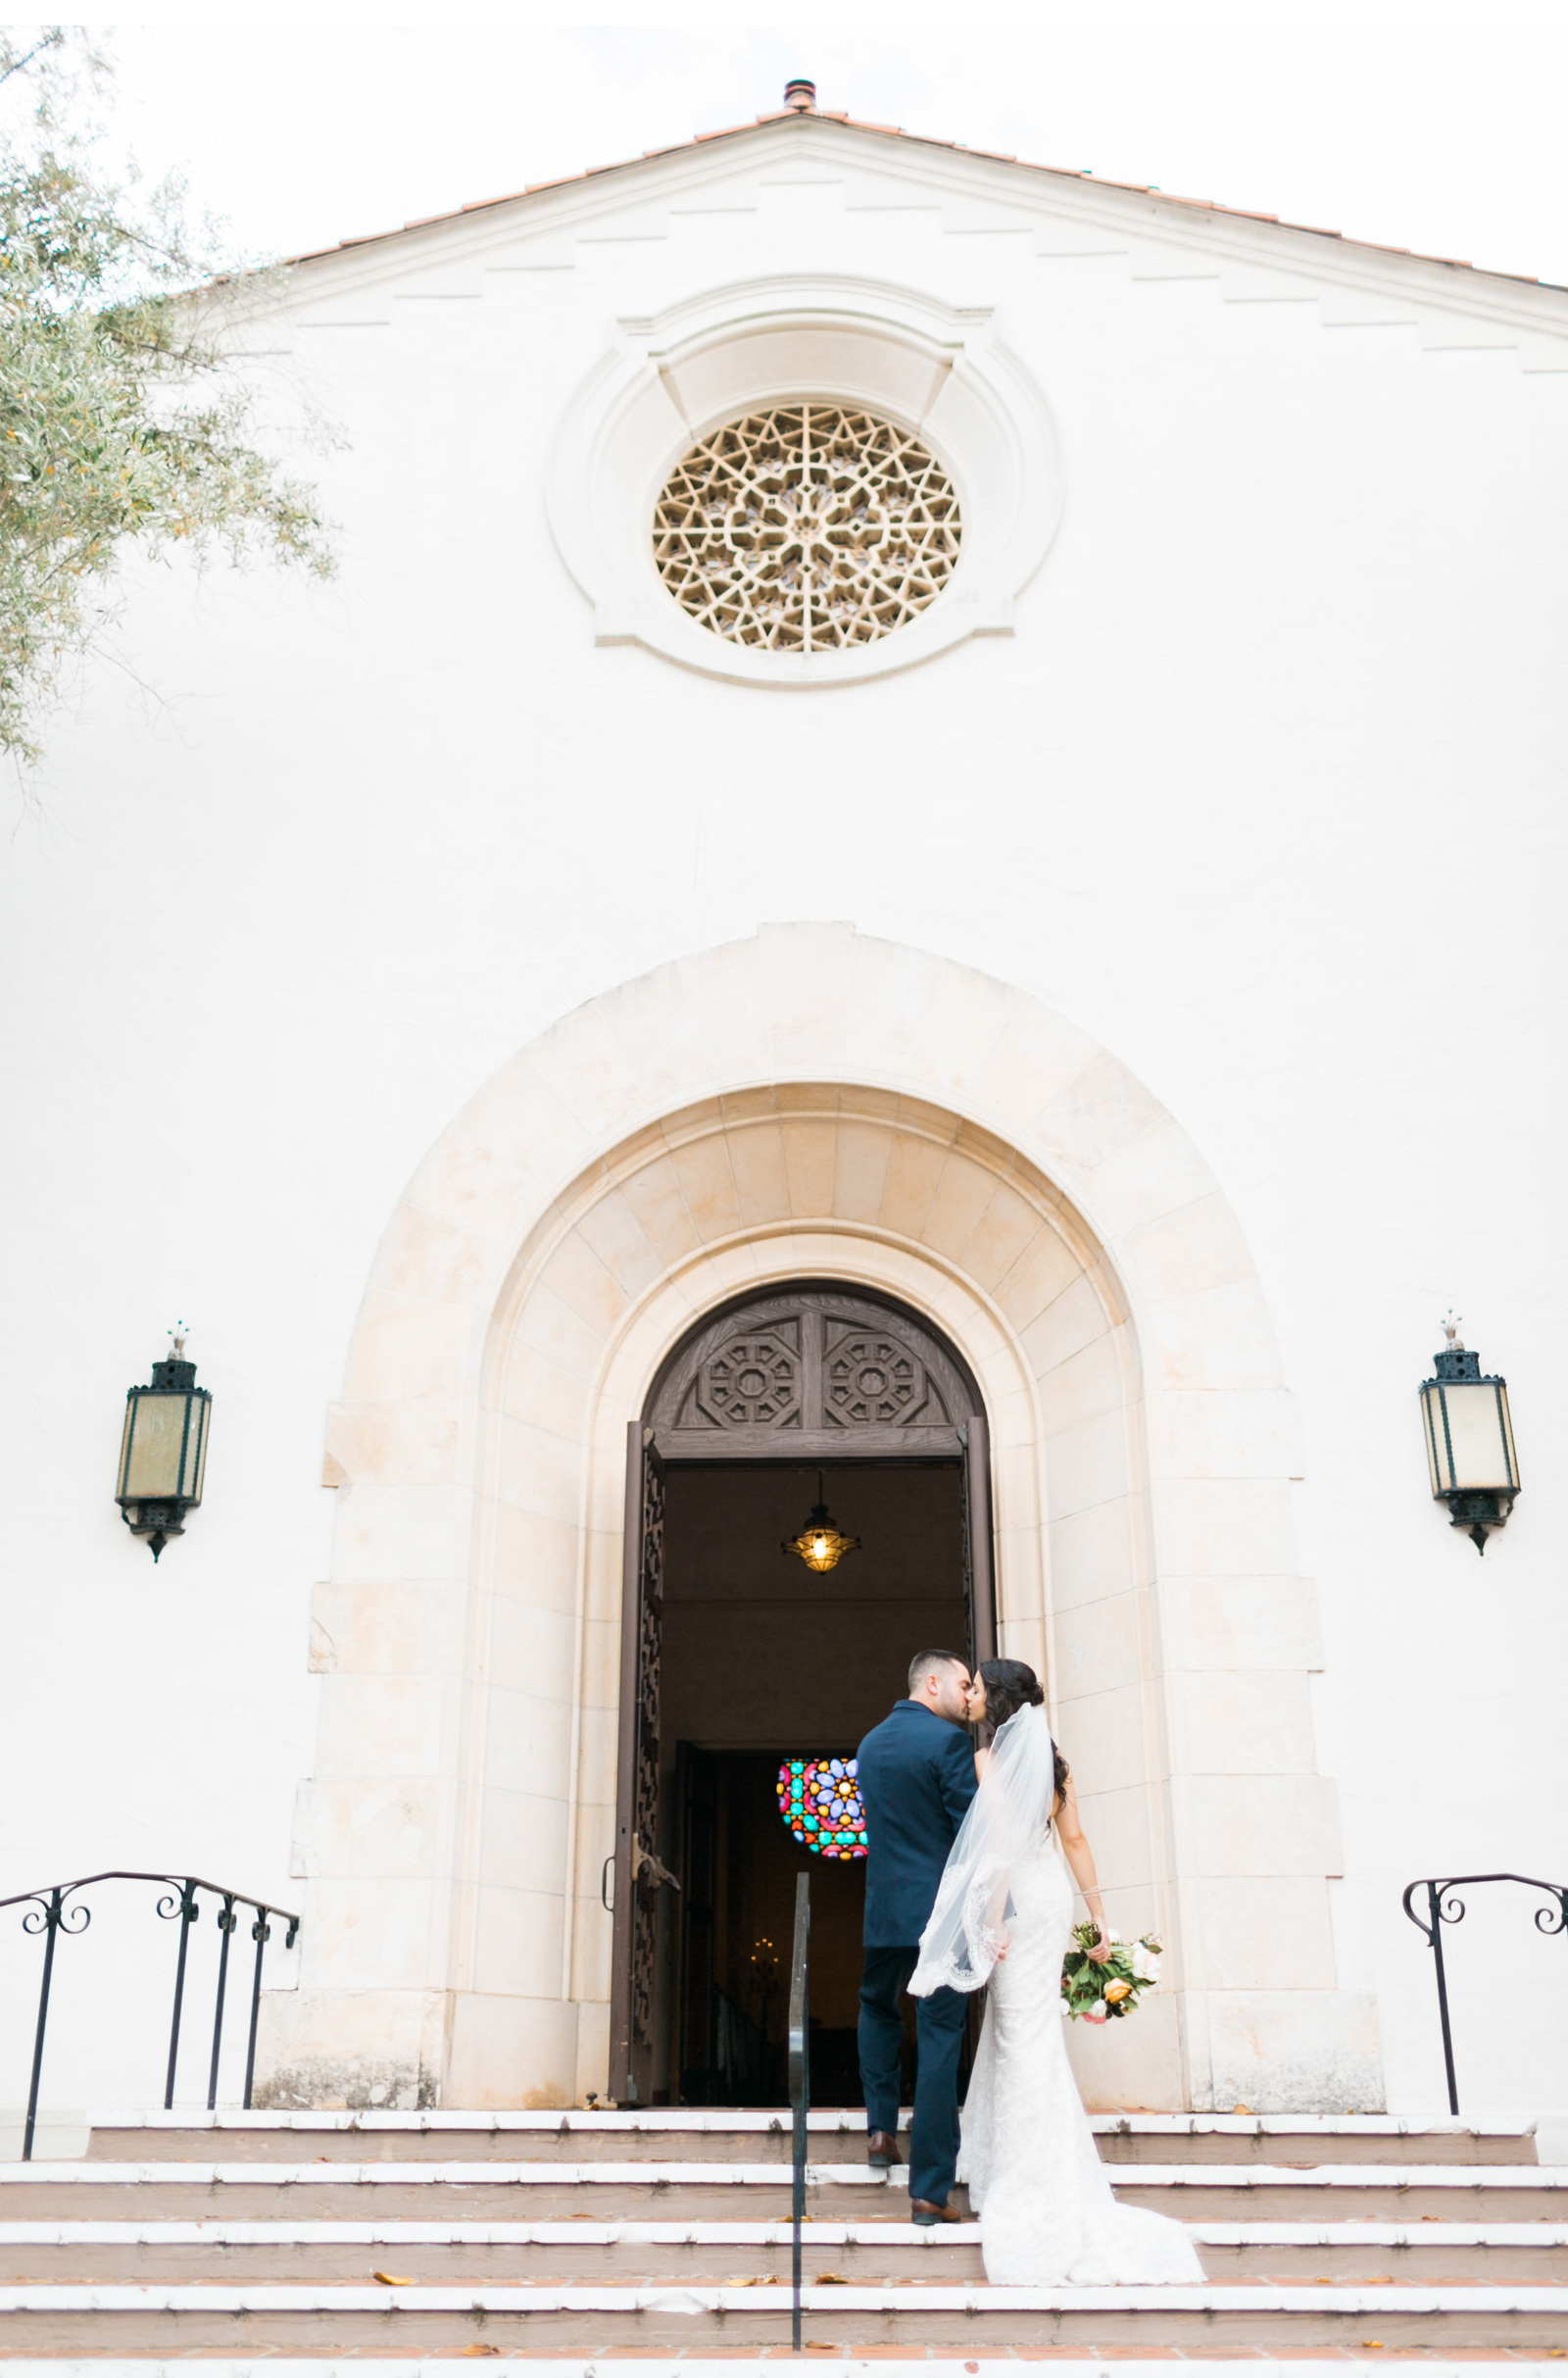 Adventure-Wedding-Photographer-Natalie-Schutt-Photography_10.jpg